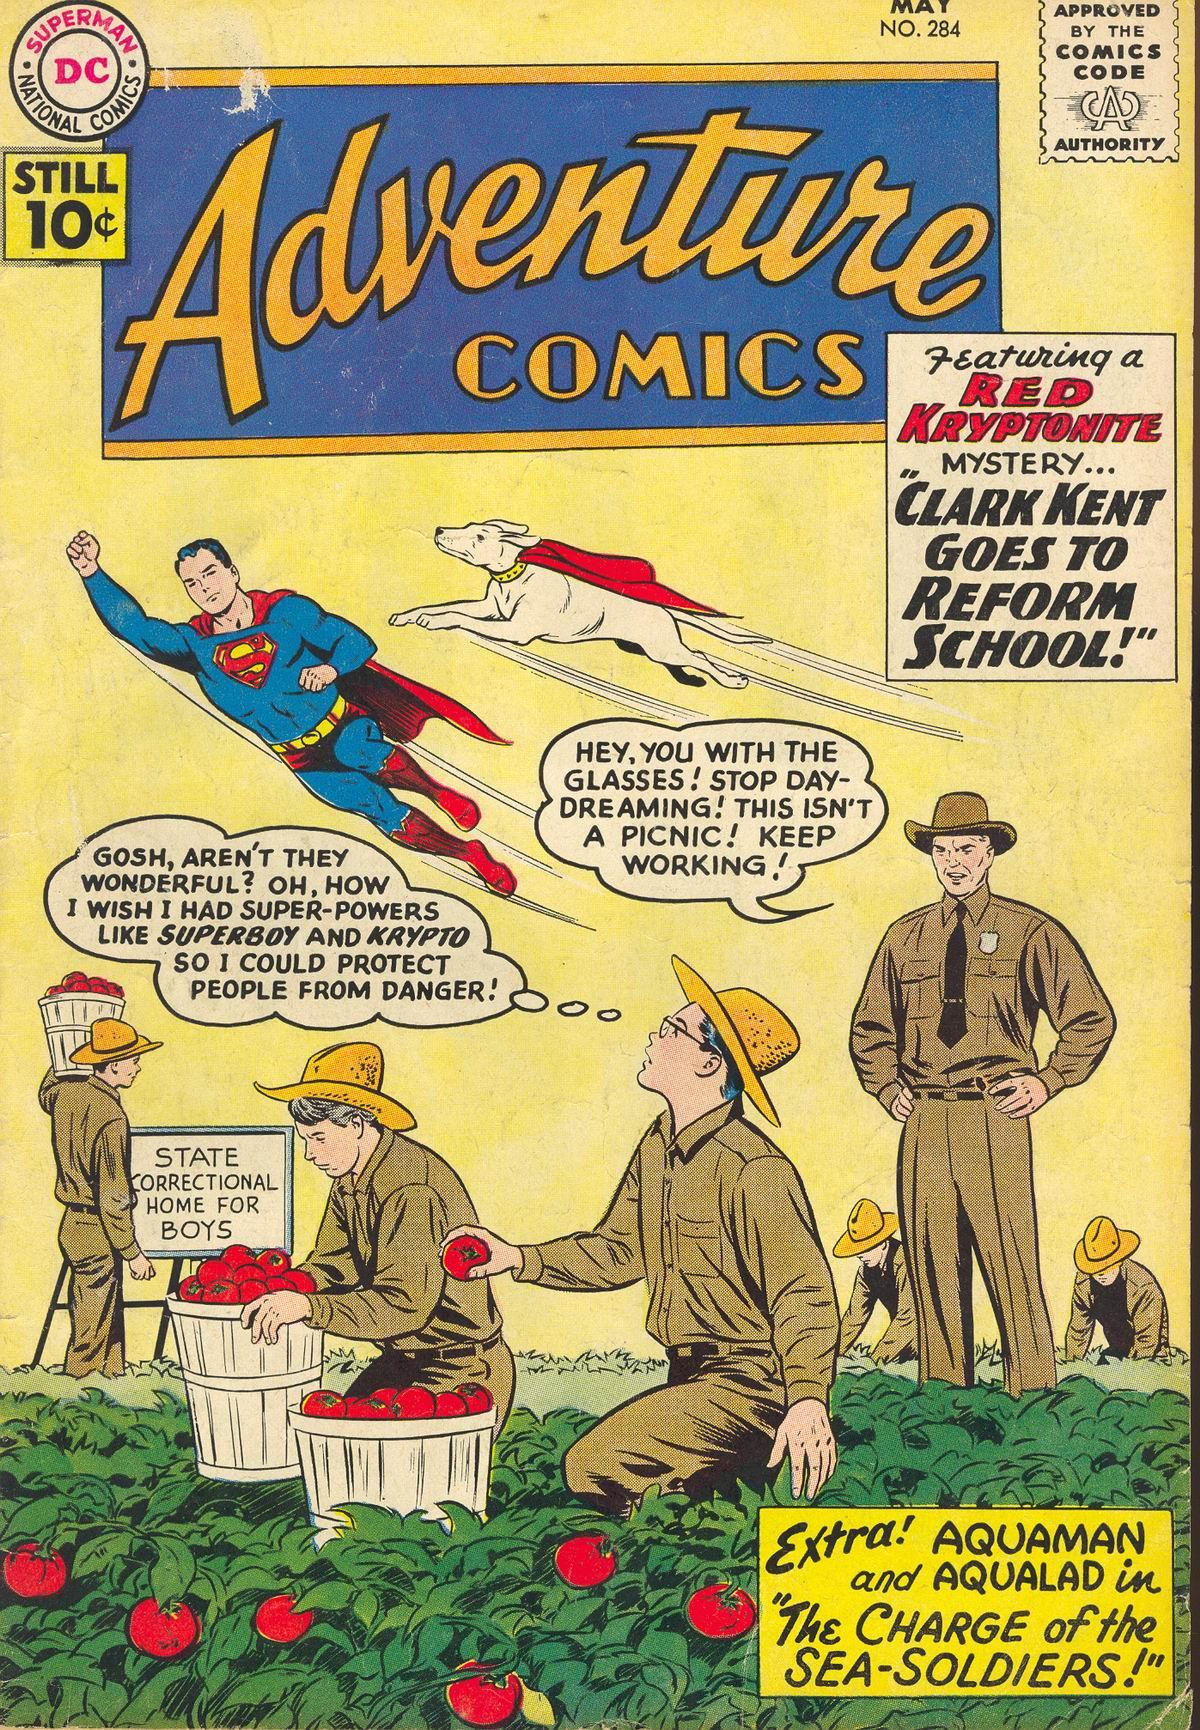 Read online Adventure Comics (1938) comic -  Issue #284 - 1